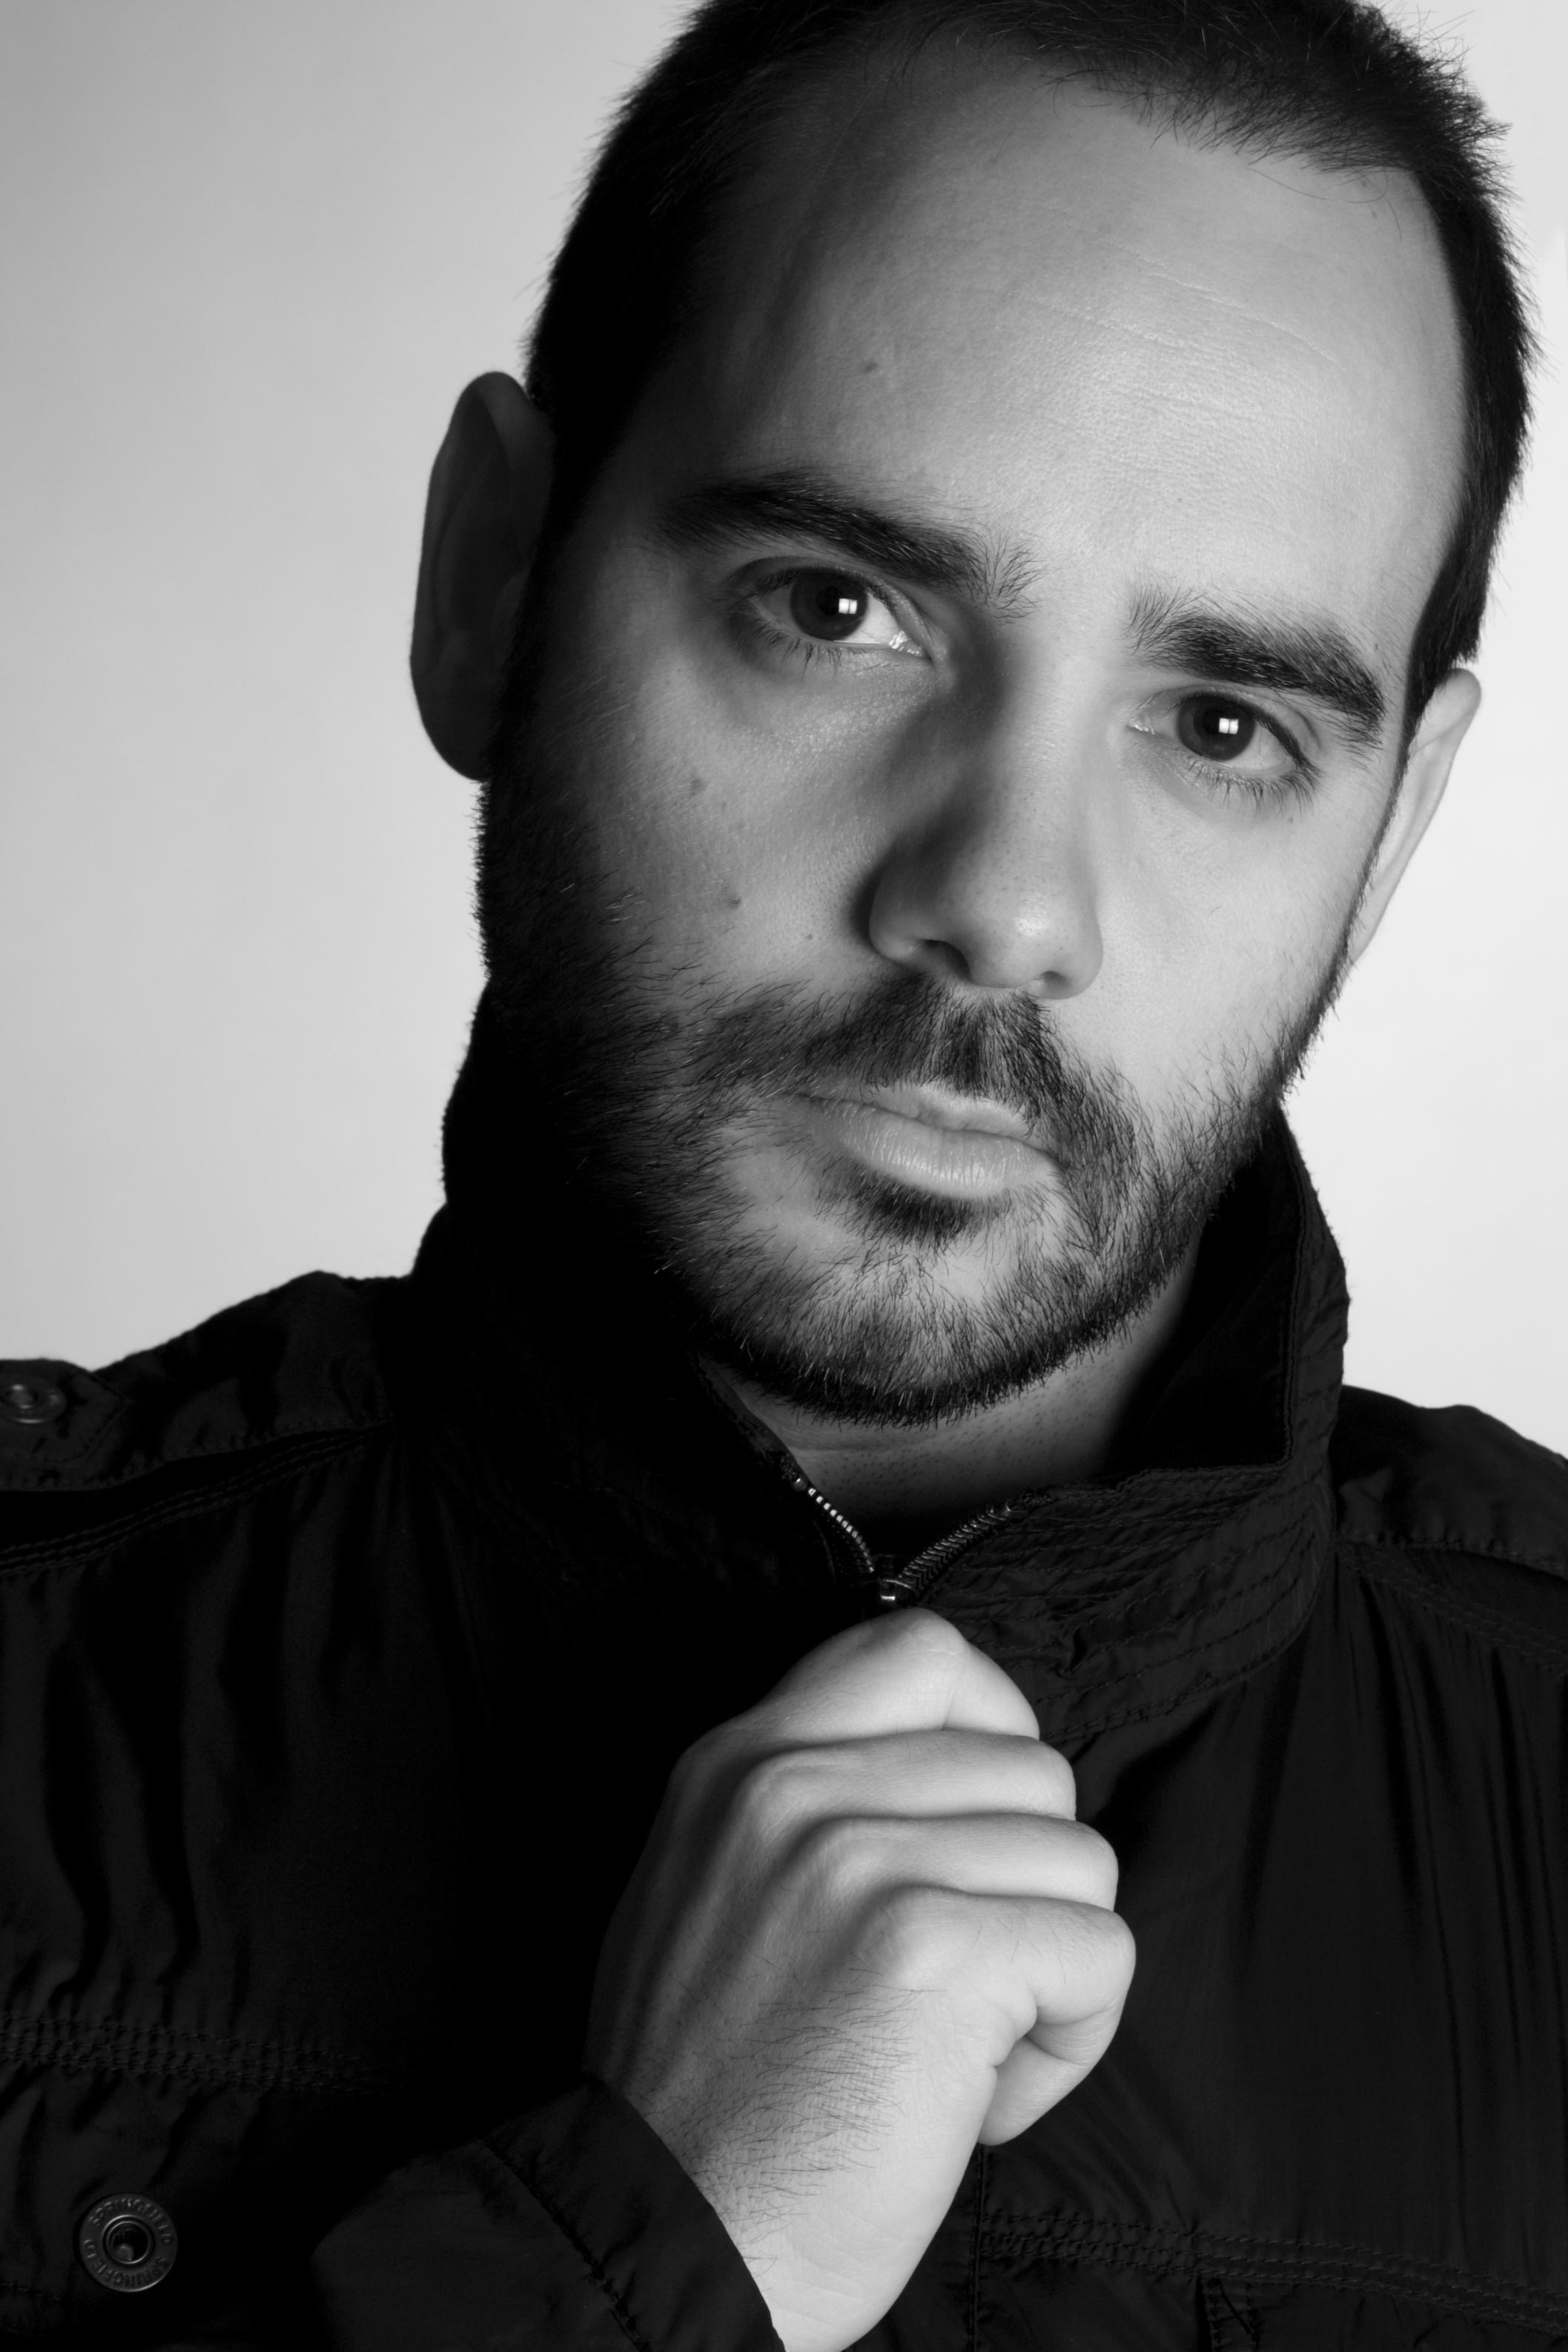 Ruben Fernandez Aguirre